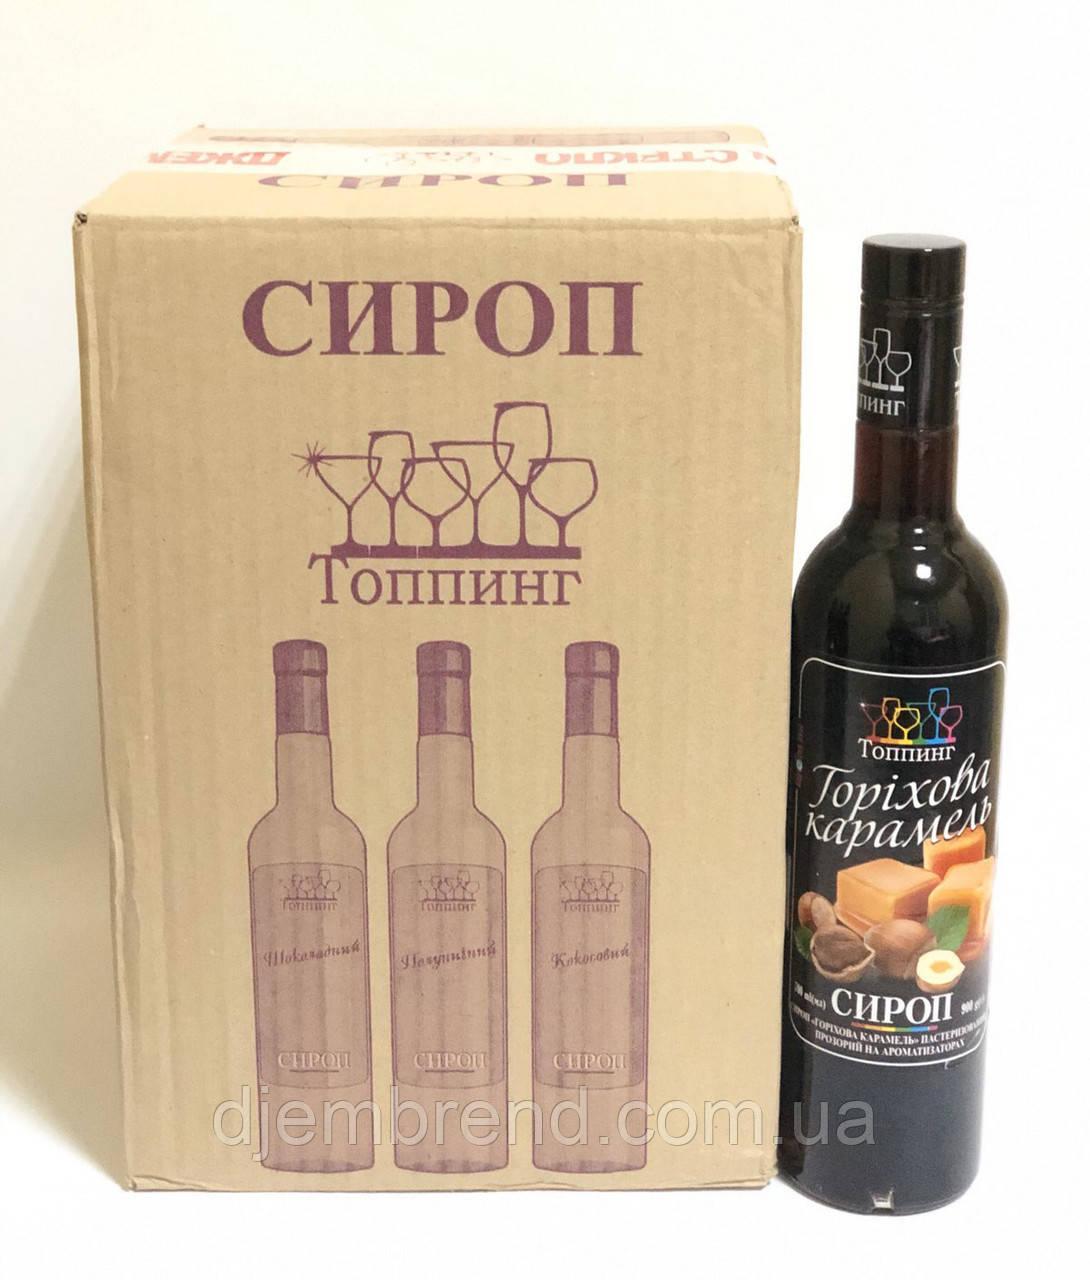 Сироп Ореховая карамель ТМ Топпинг, 900г Цена 59 грн/шт.